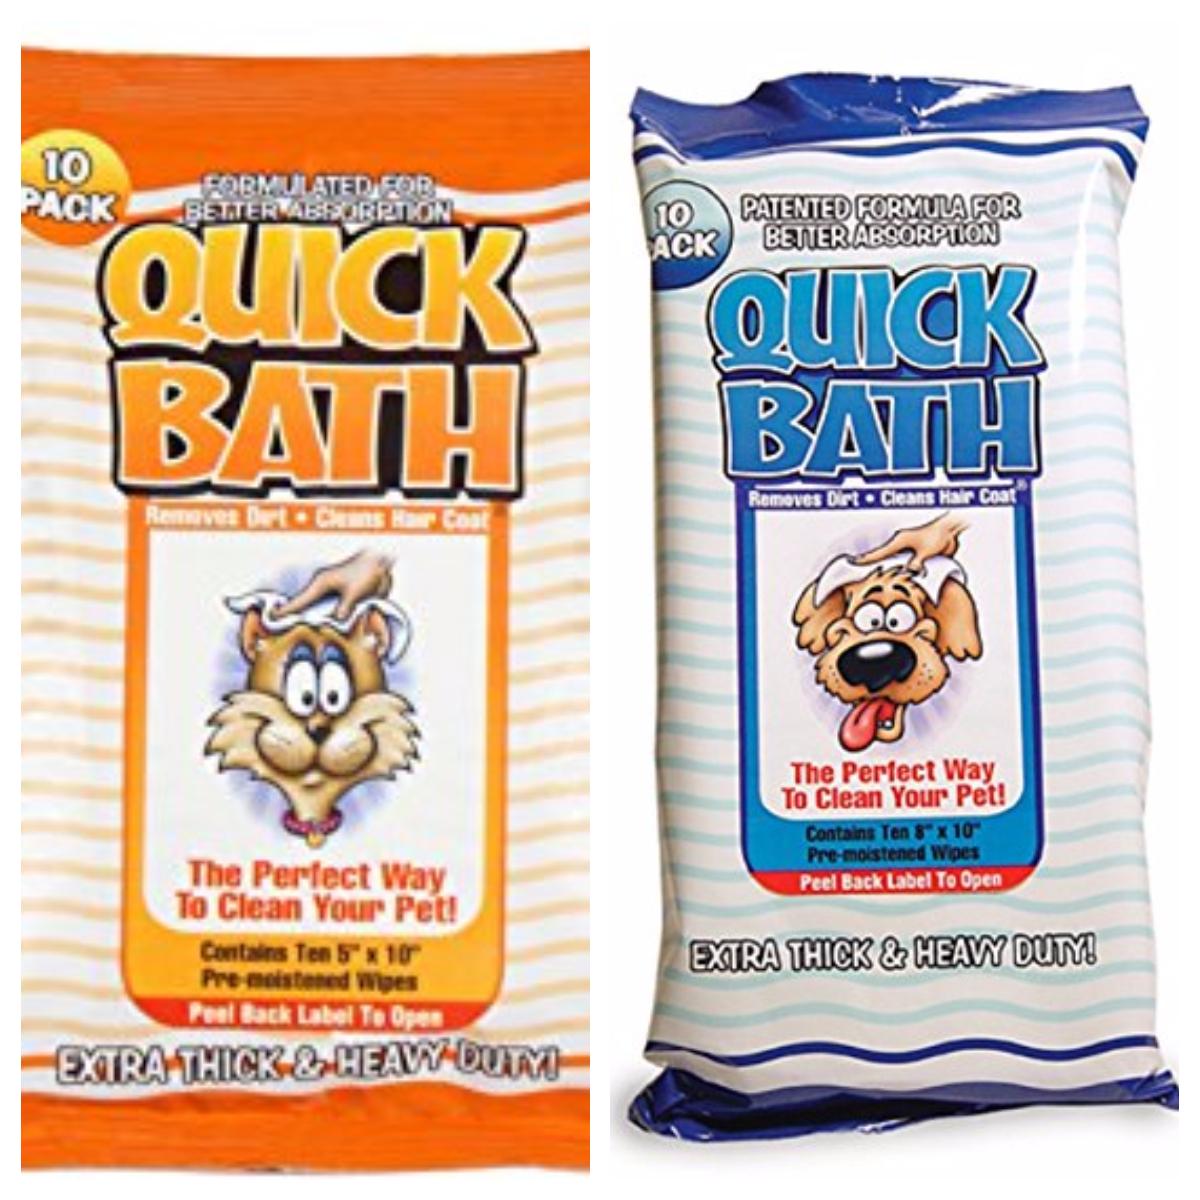 Quick Bath Collage